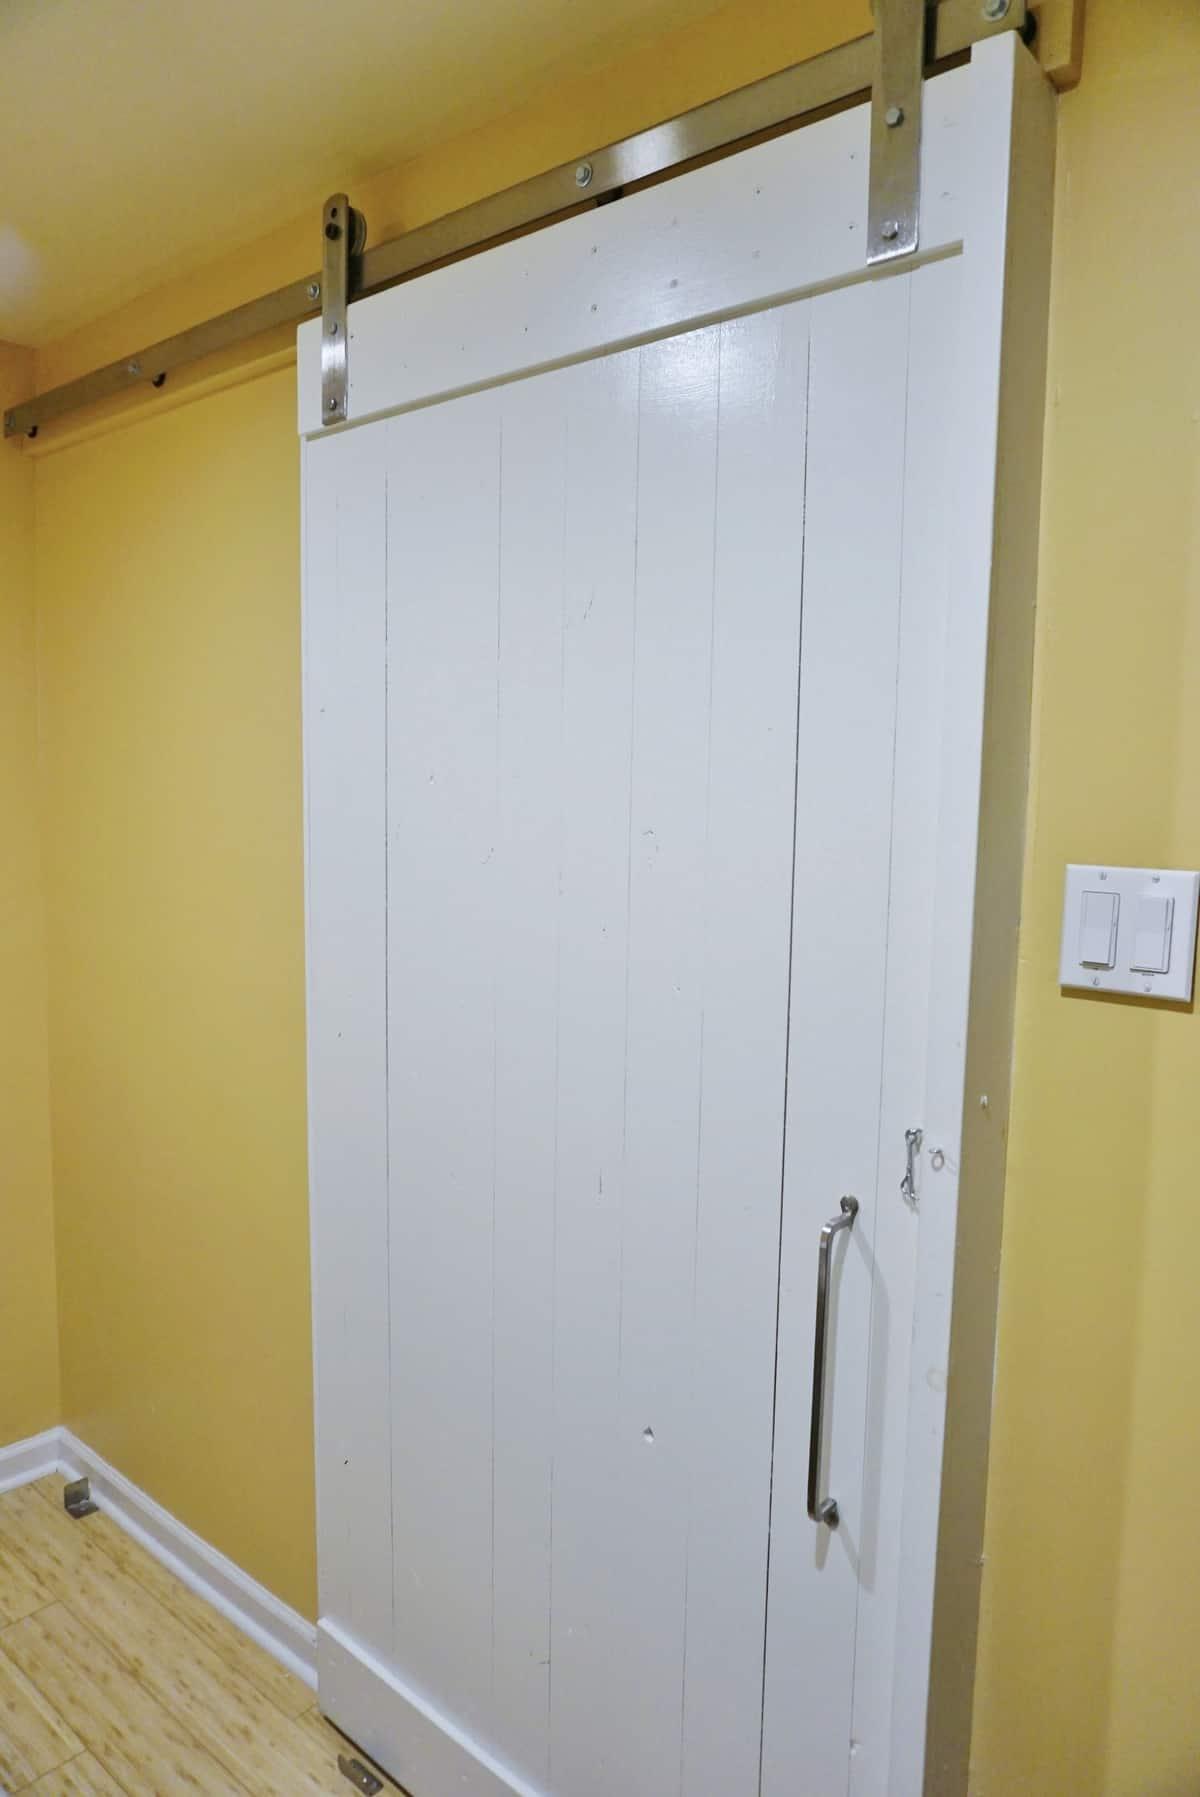 Chic Barn Door Saves Space